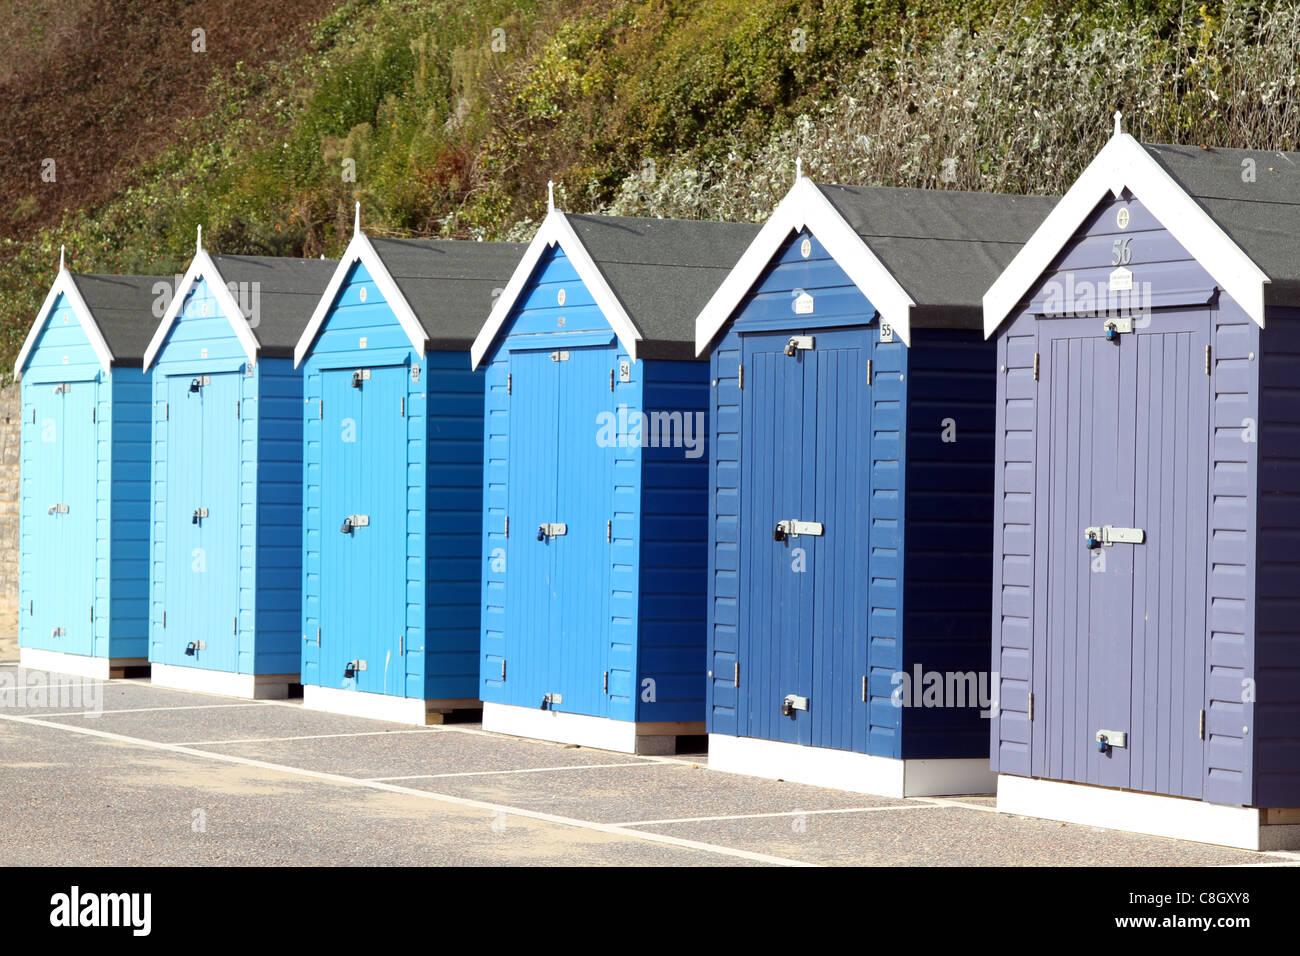 colourful beachhuts on bournemouth beach - Stock Image